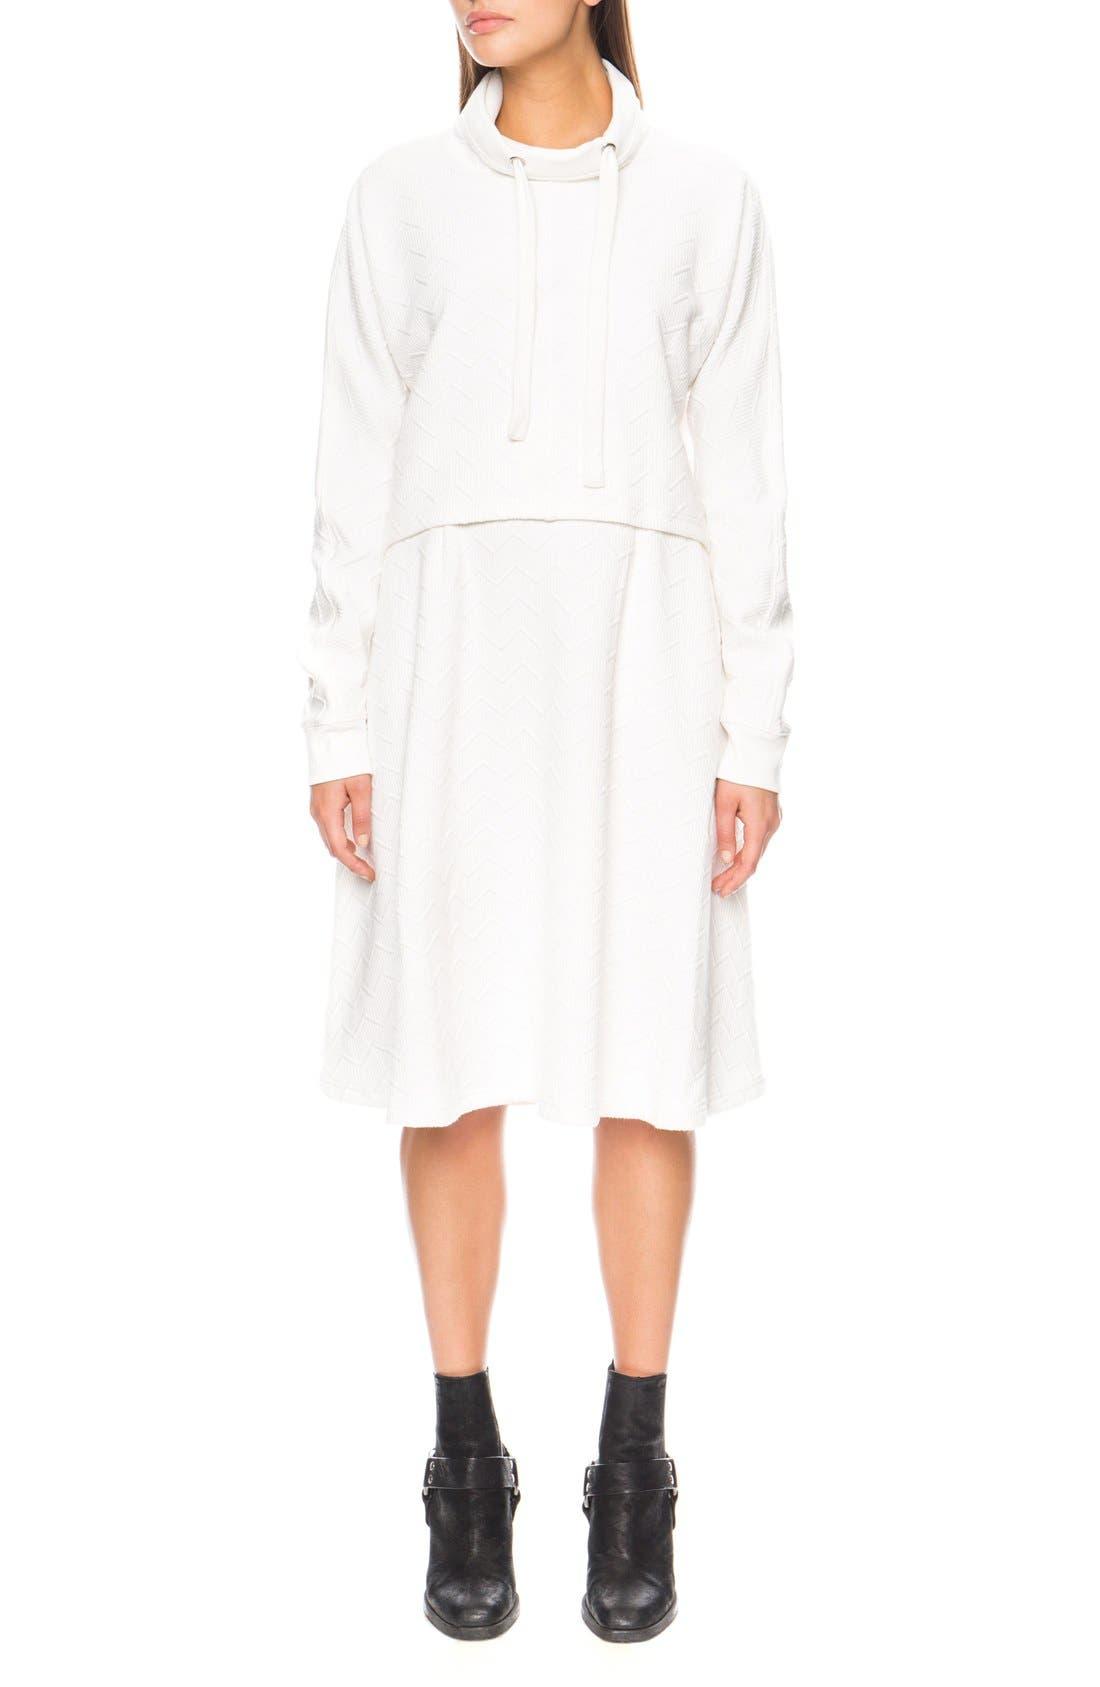 Main Image - The Fifth Label 'Passport' Midi Skirt